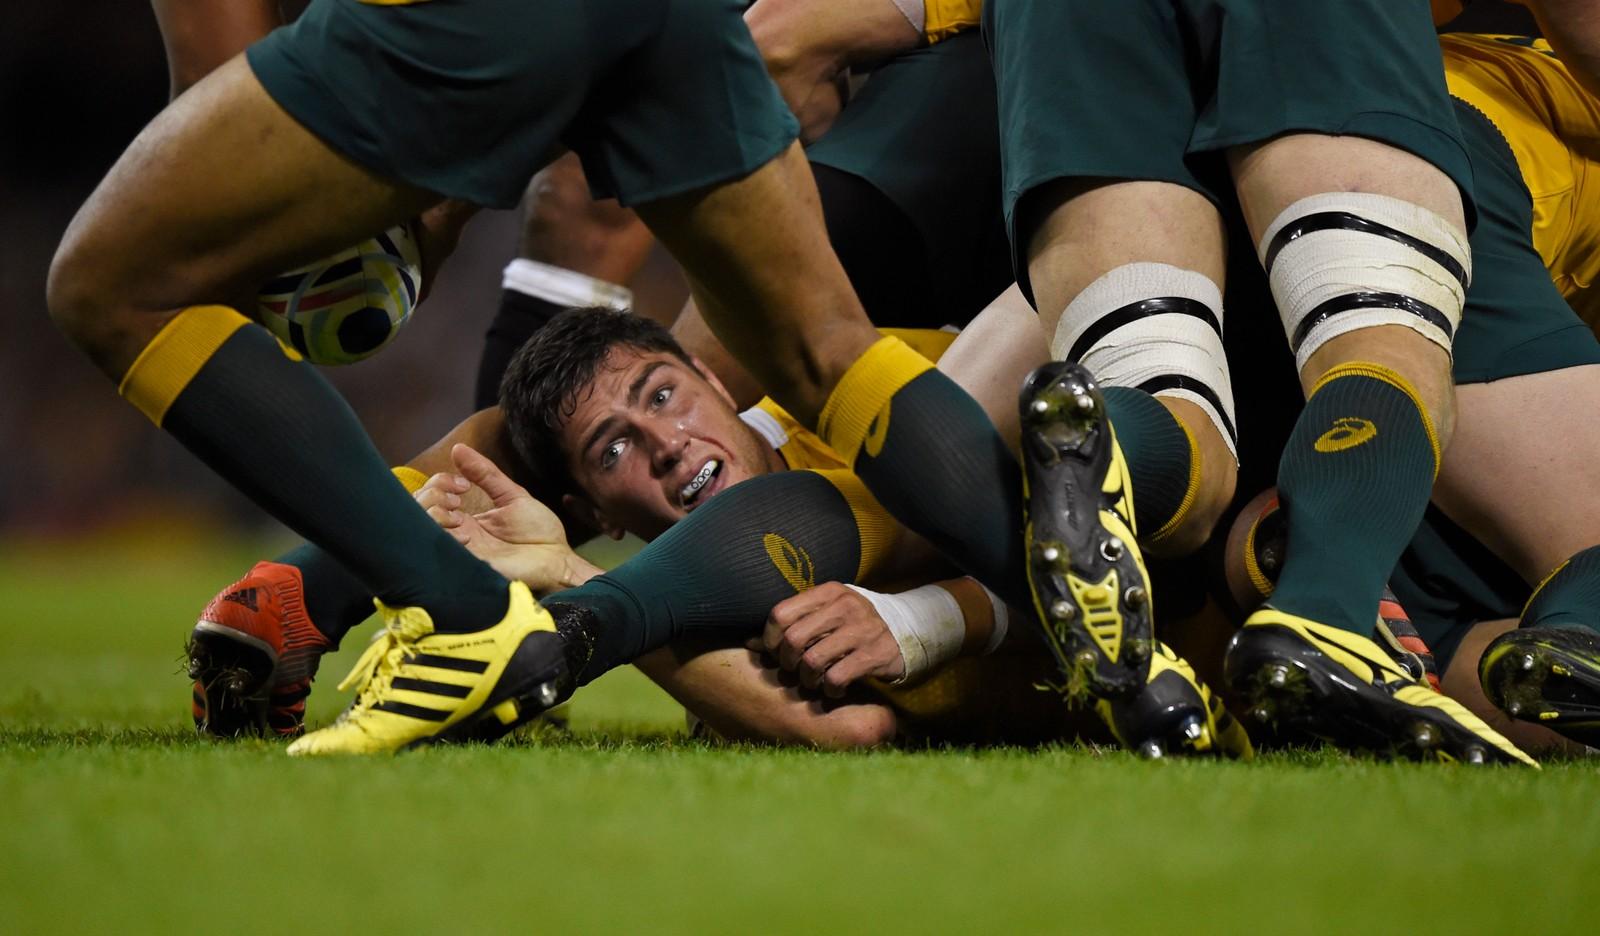 Australia og Fiji barker sammen i rugby-VM i Wales, som pågår nå.